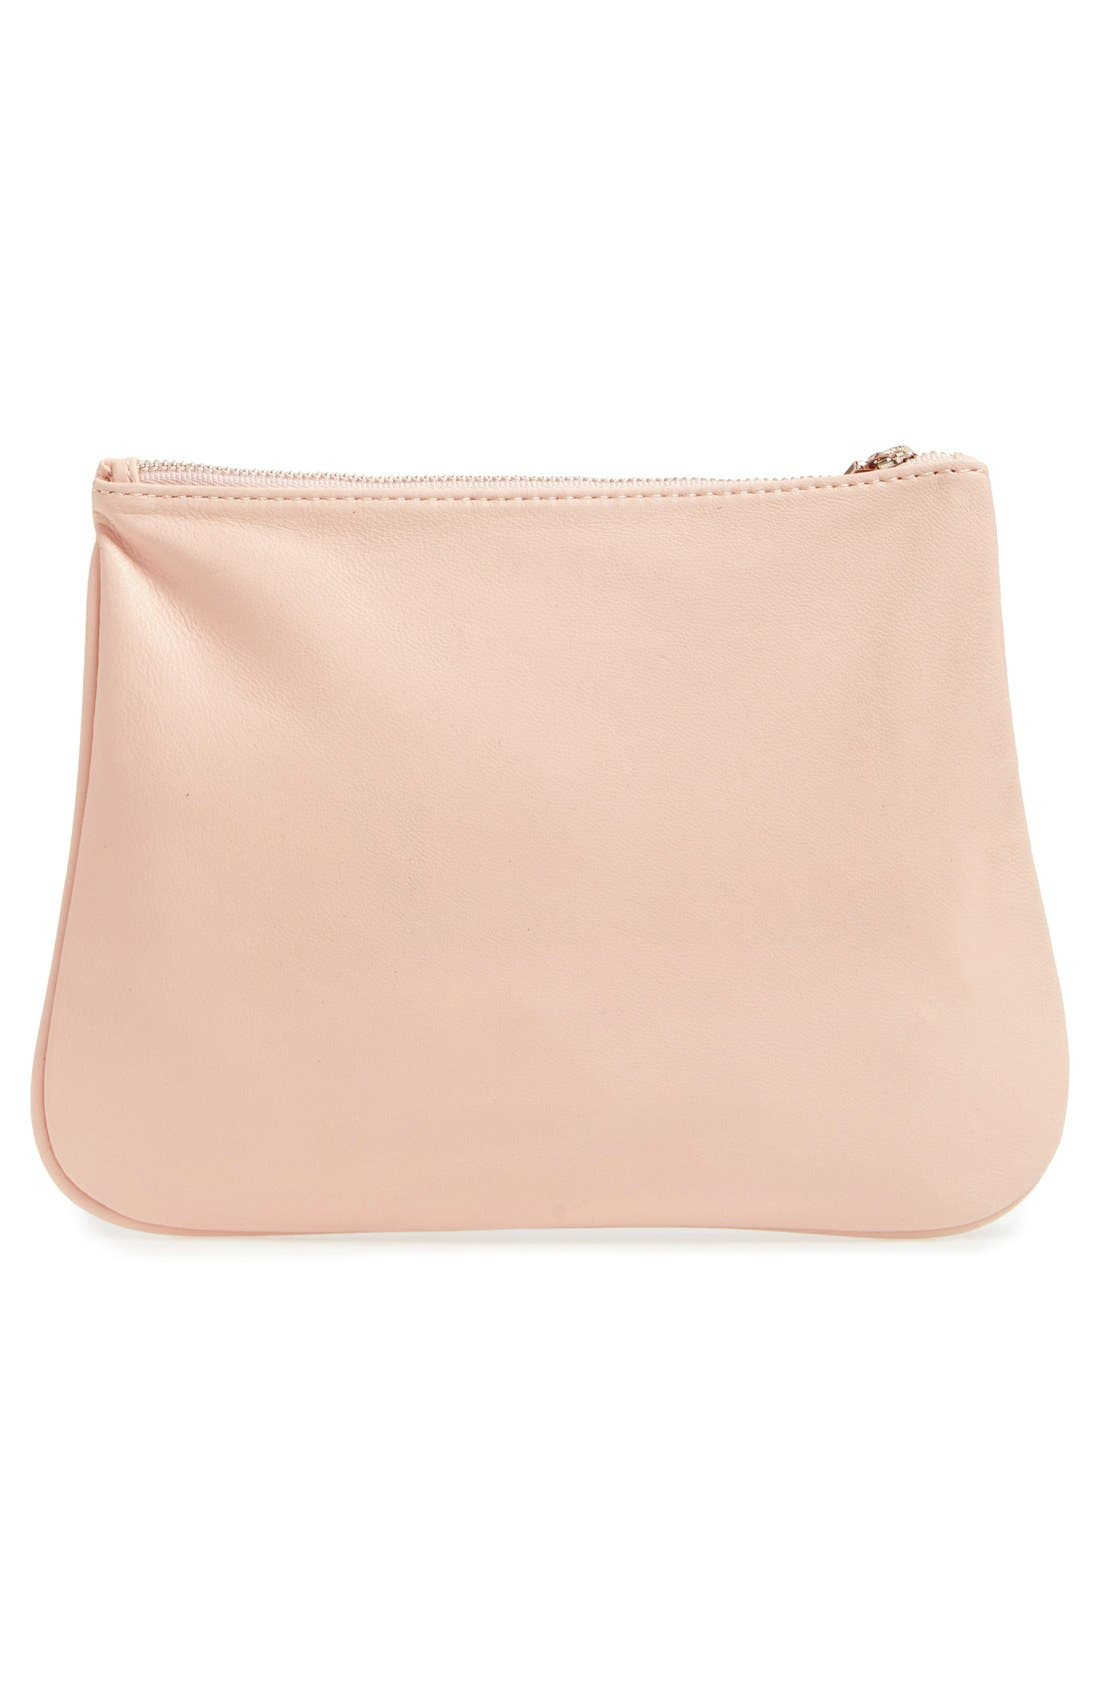 'IT' Cosmetics Bag,                             Alternate thumbnail 8, color,